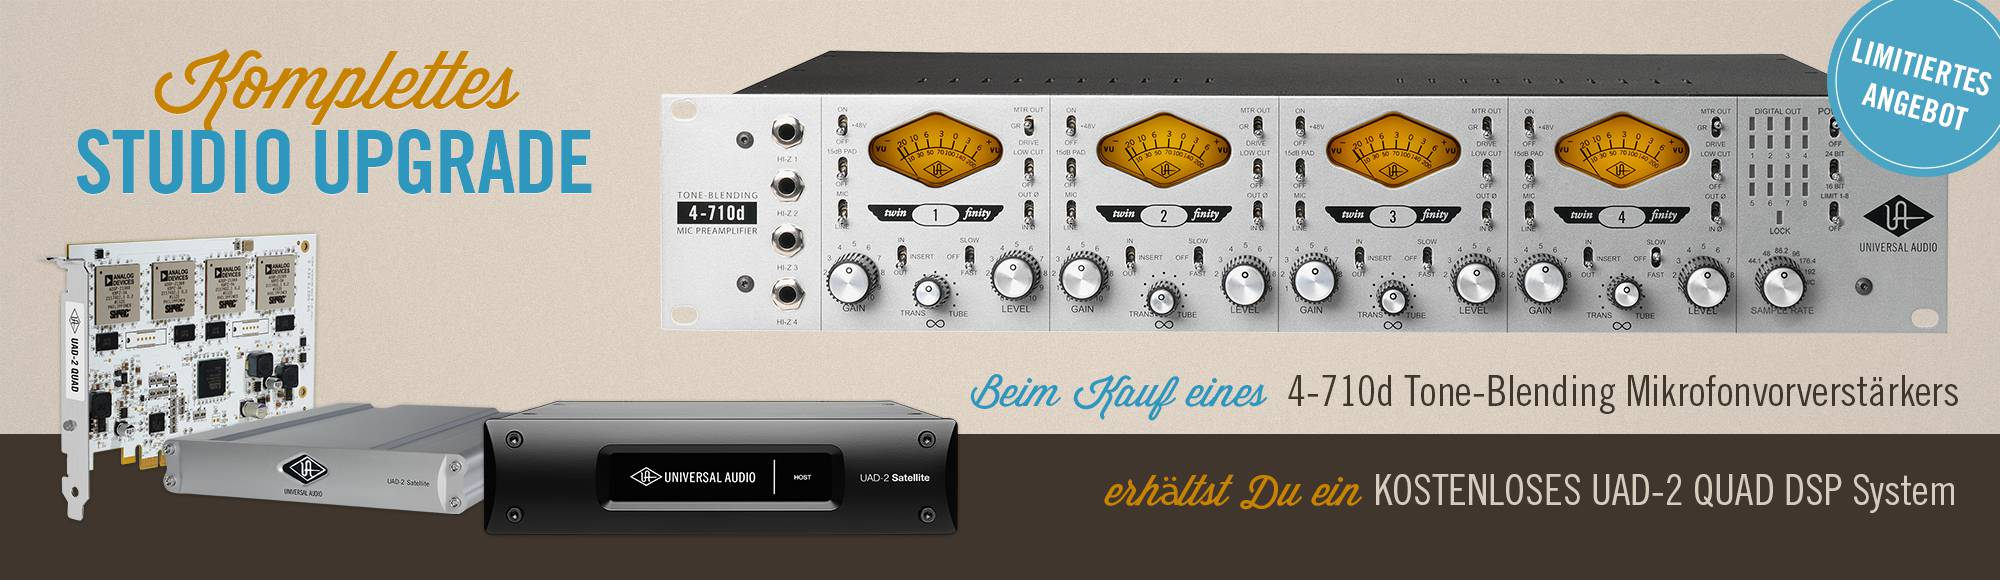 Universal Audio Studio Upgrade